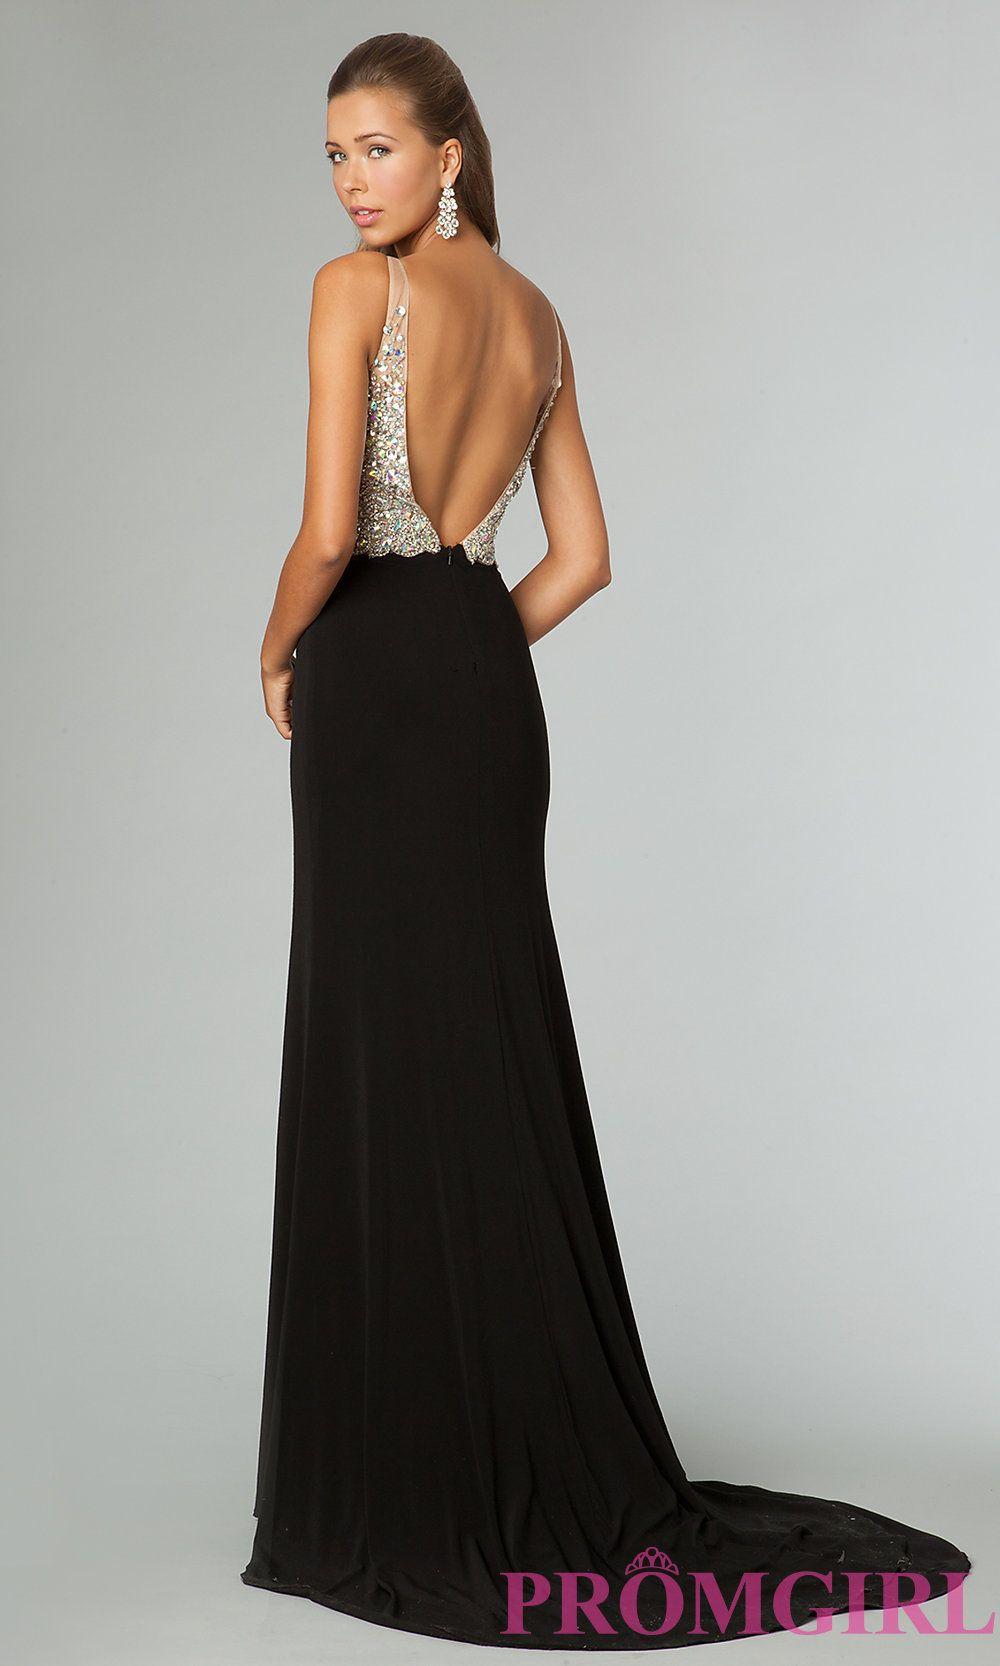 Long prom dress style jojvnjvn back image wedding ideas